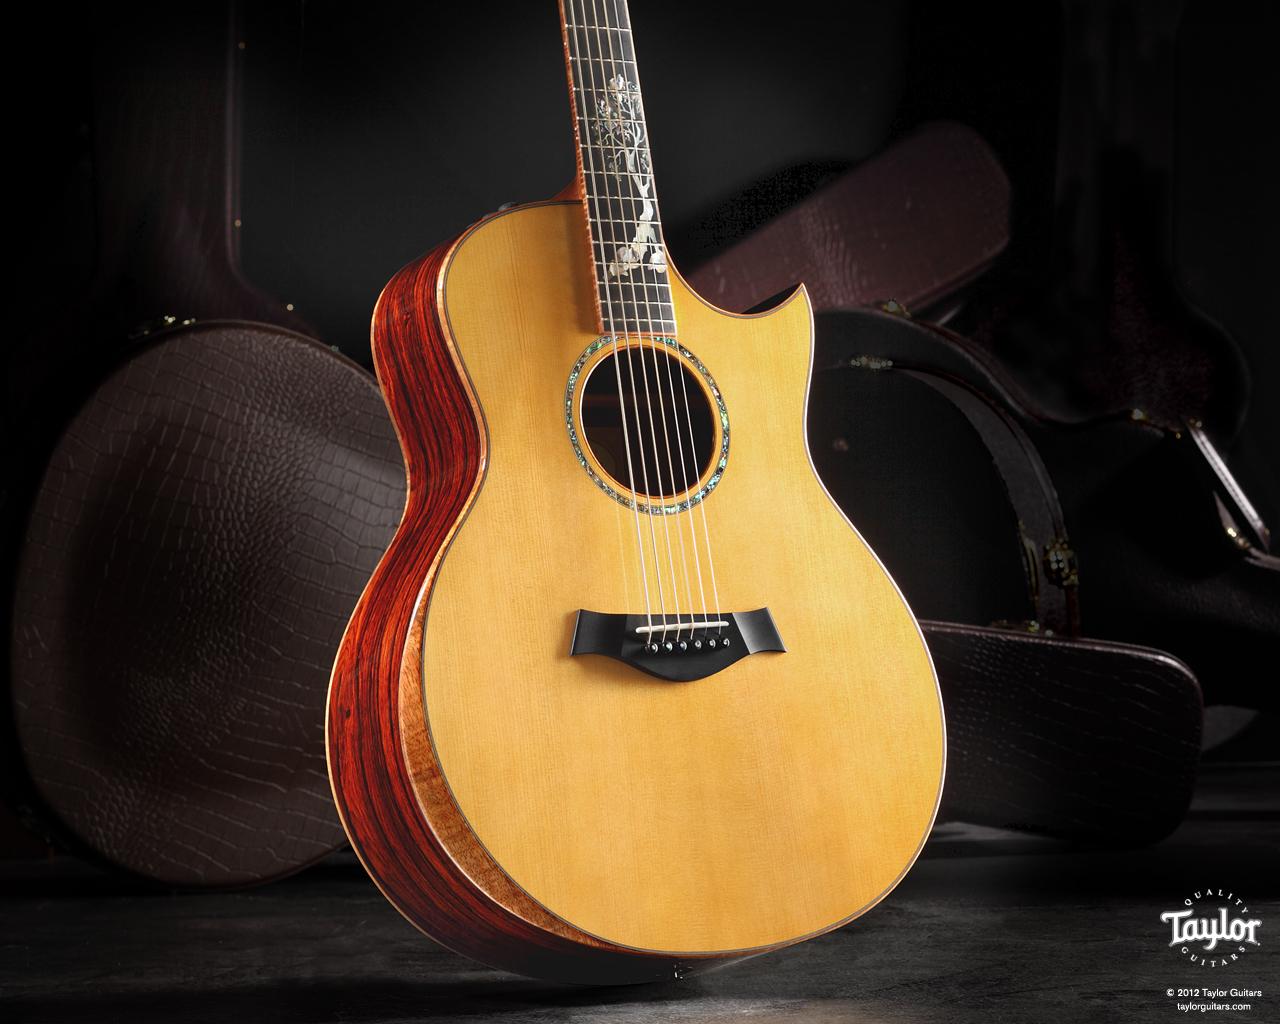 taylor guitars wallpapers - photo #5